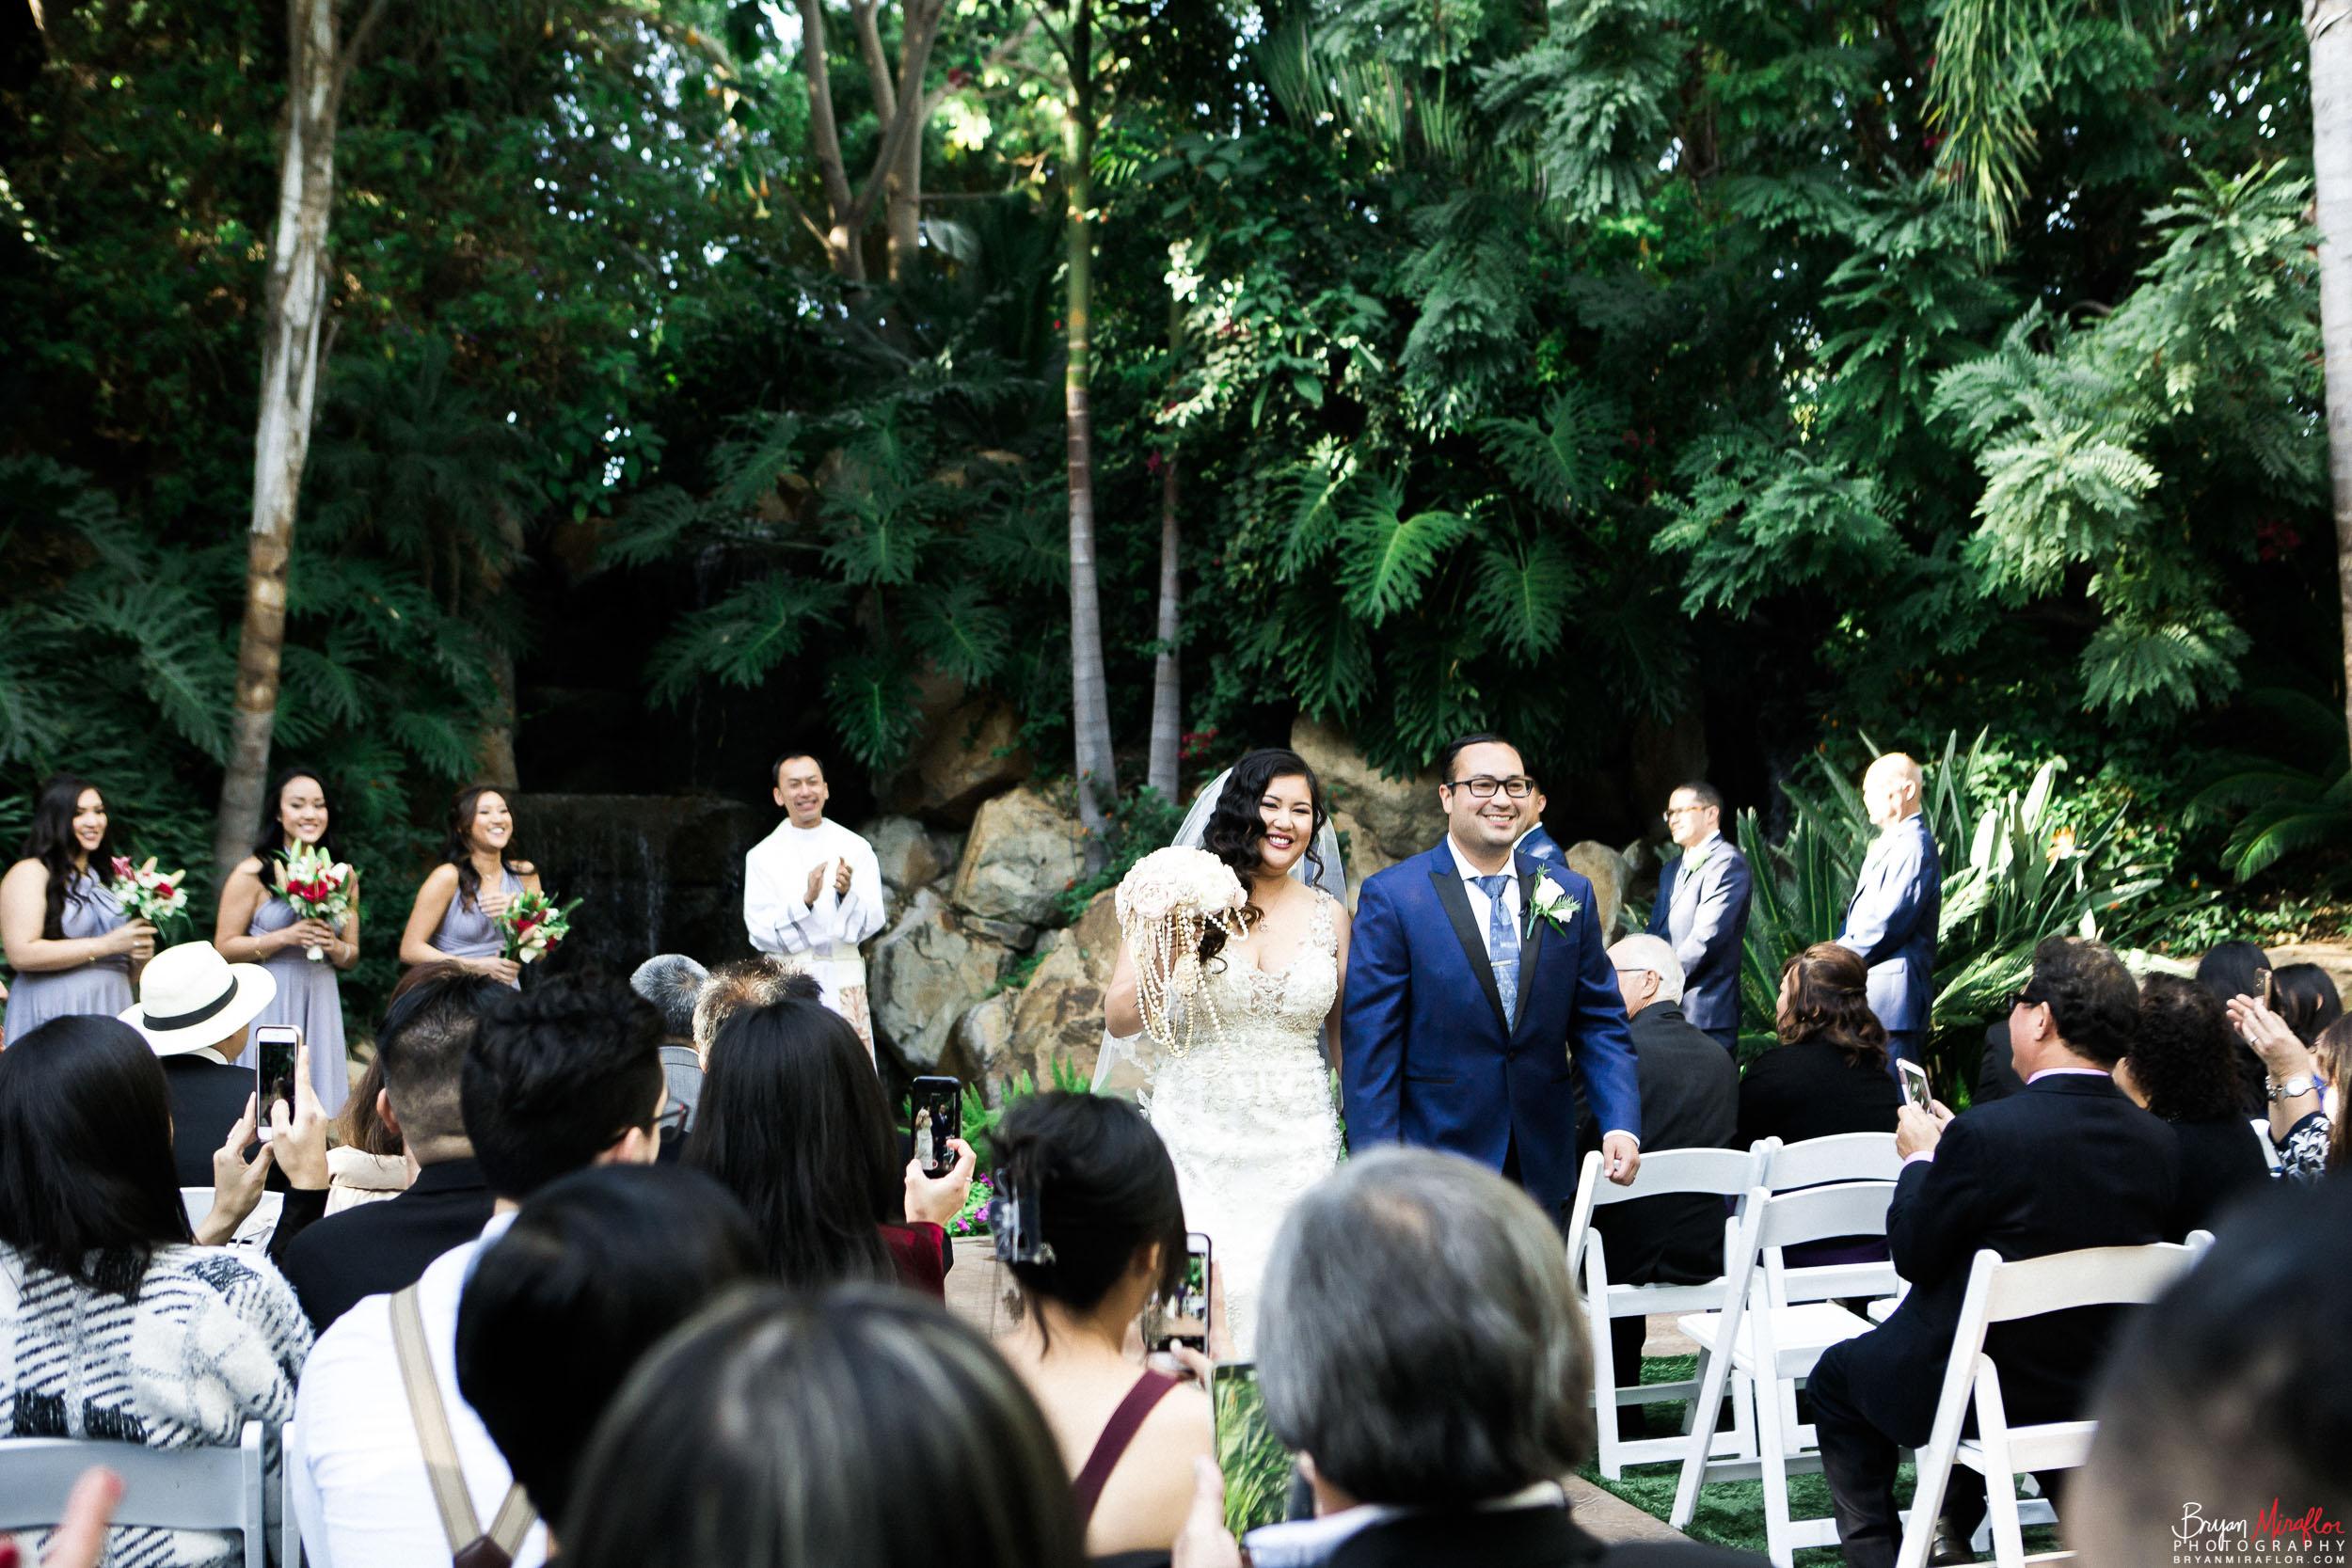 Bryan-Miraflor-Photography-Hannah-Jonathan-Married-Grand-Traditions-Estate-Gardens-Fallbrook-20171222-111.jpg